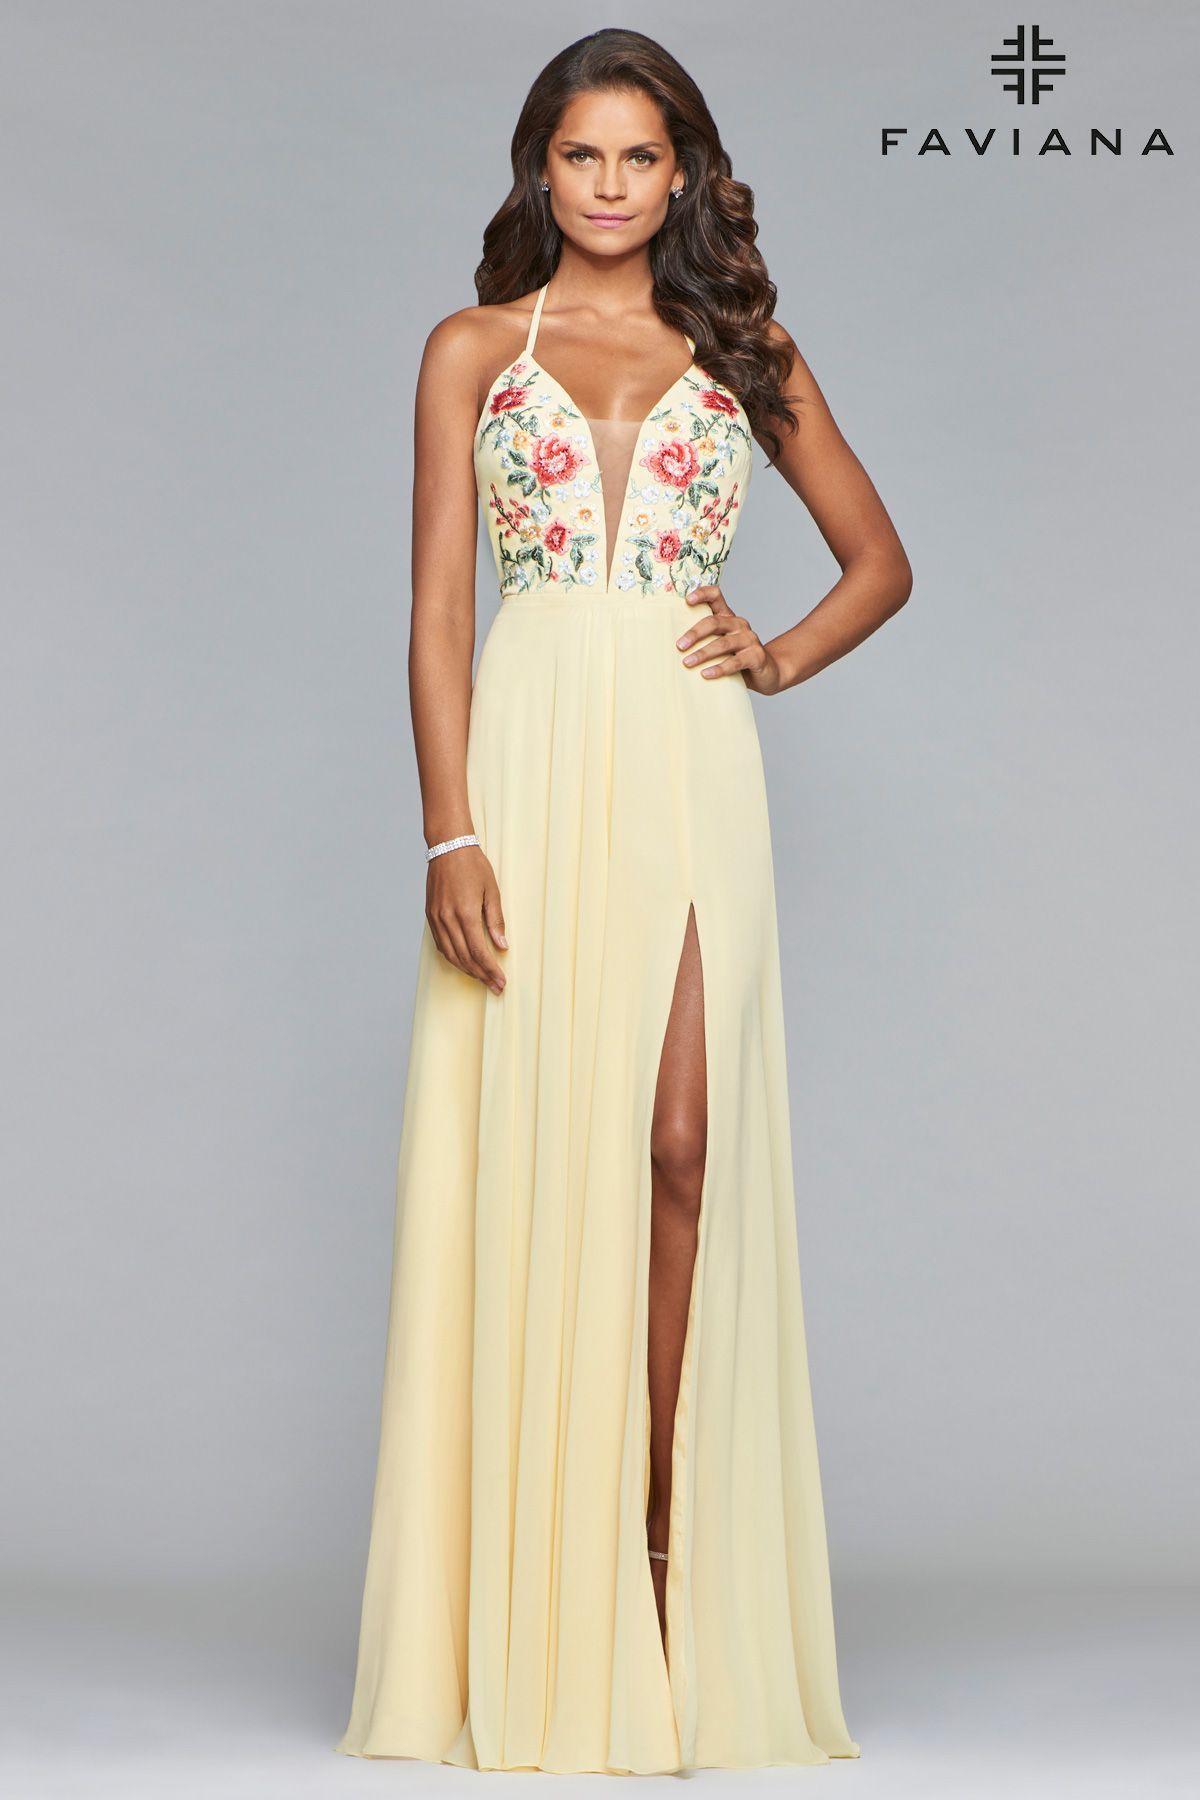 Faviana Prom Dresses